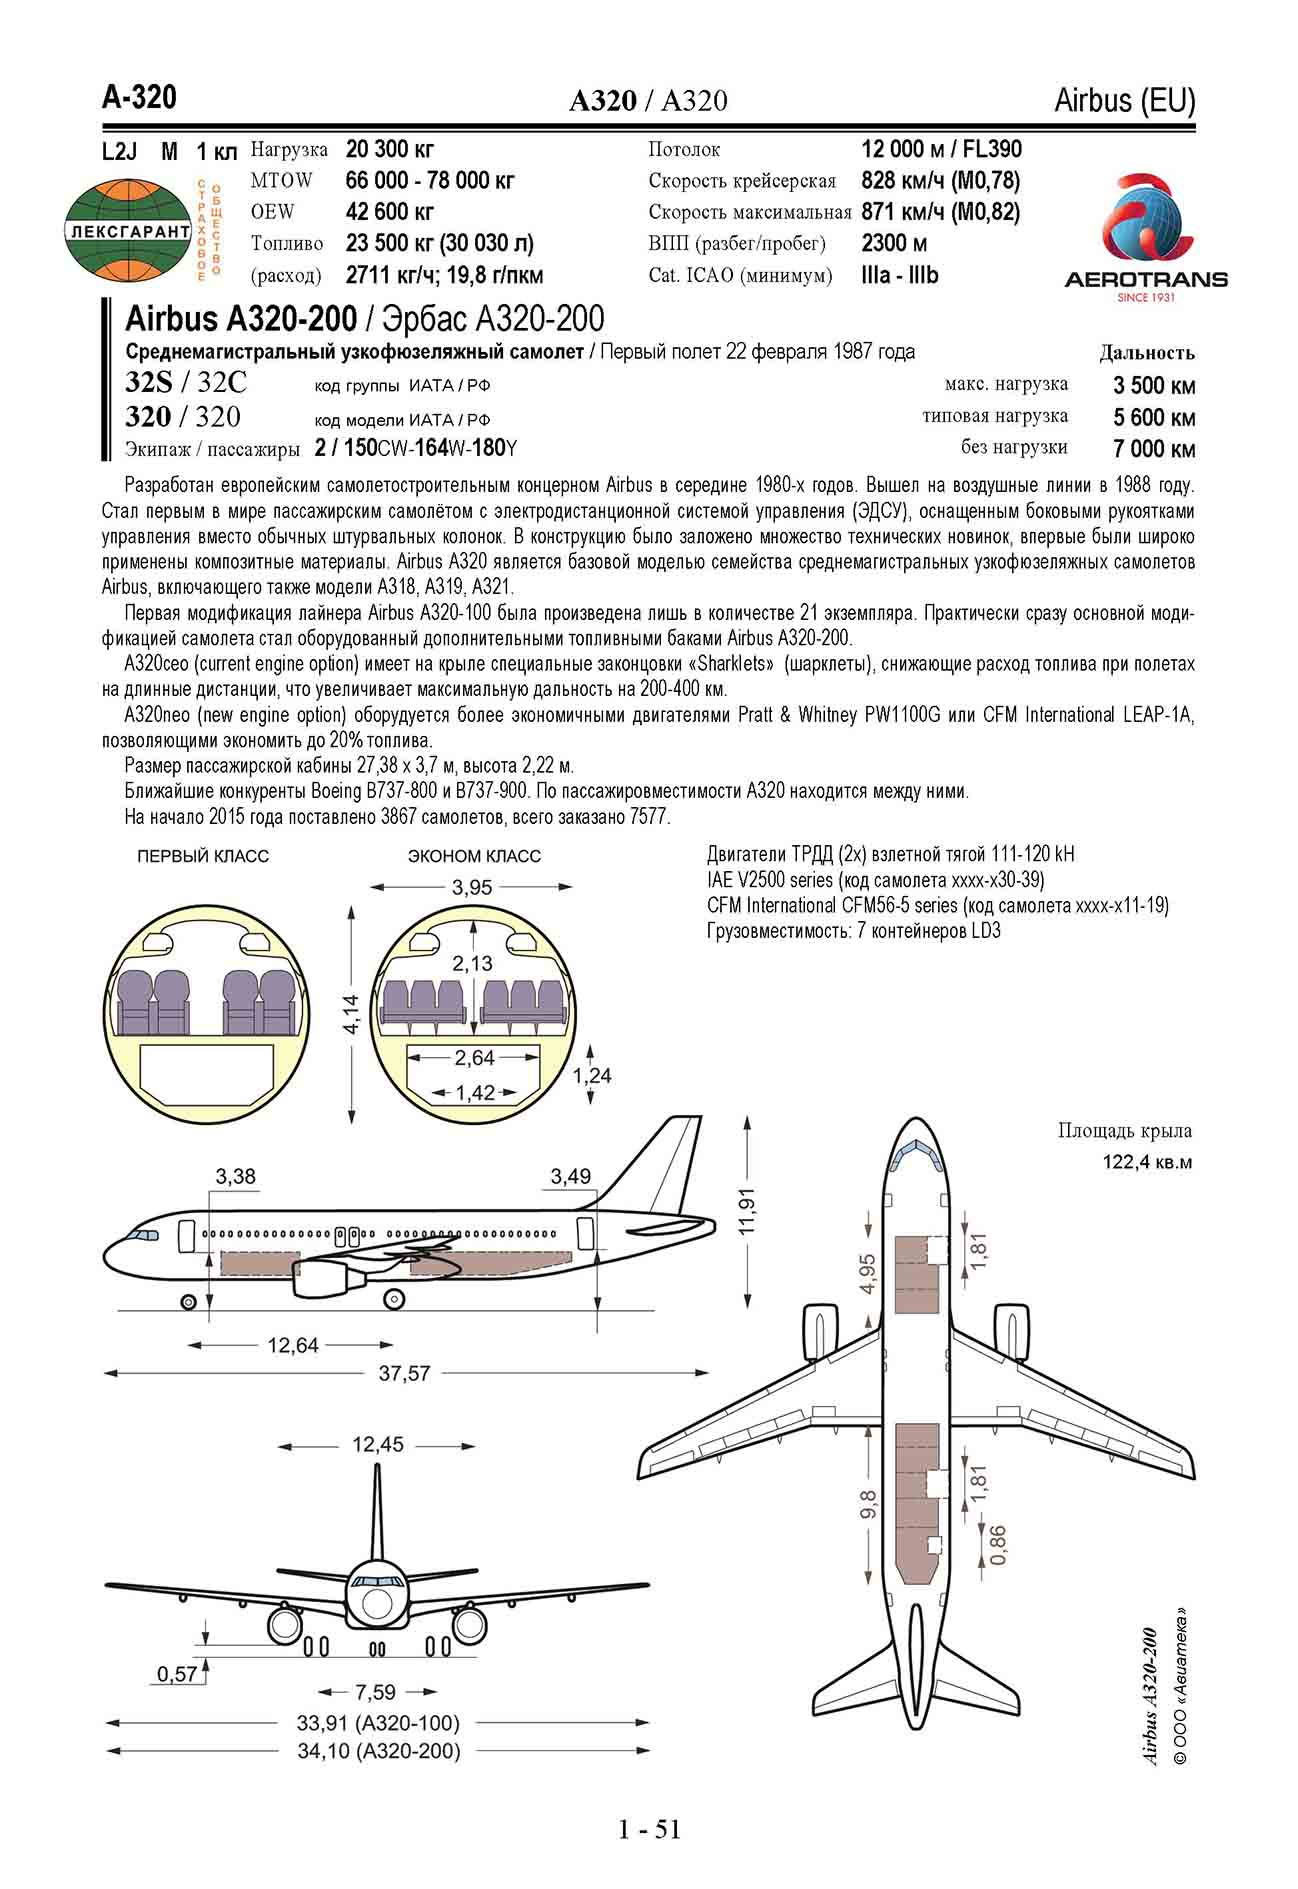 Самолет Airbus-A320